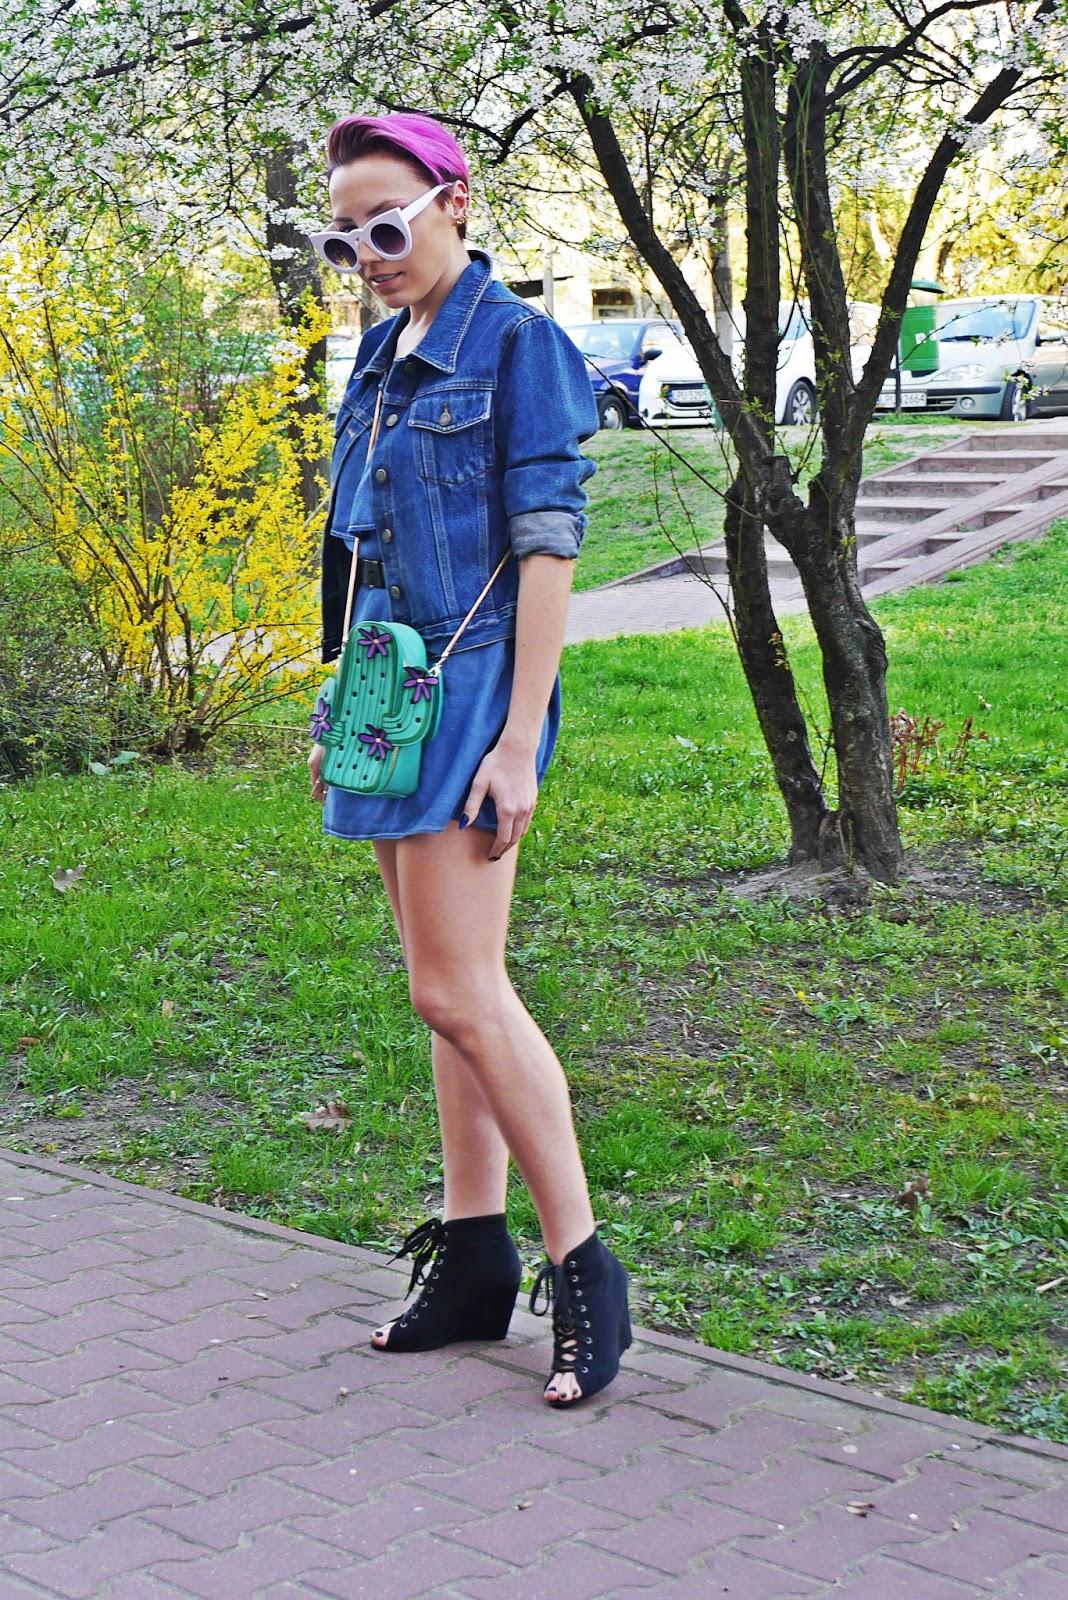 jeansowa_sukienka_torebka_kaktus_biale_okulary_koty_karyn_blog_120417d